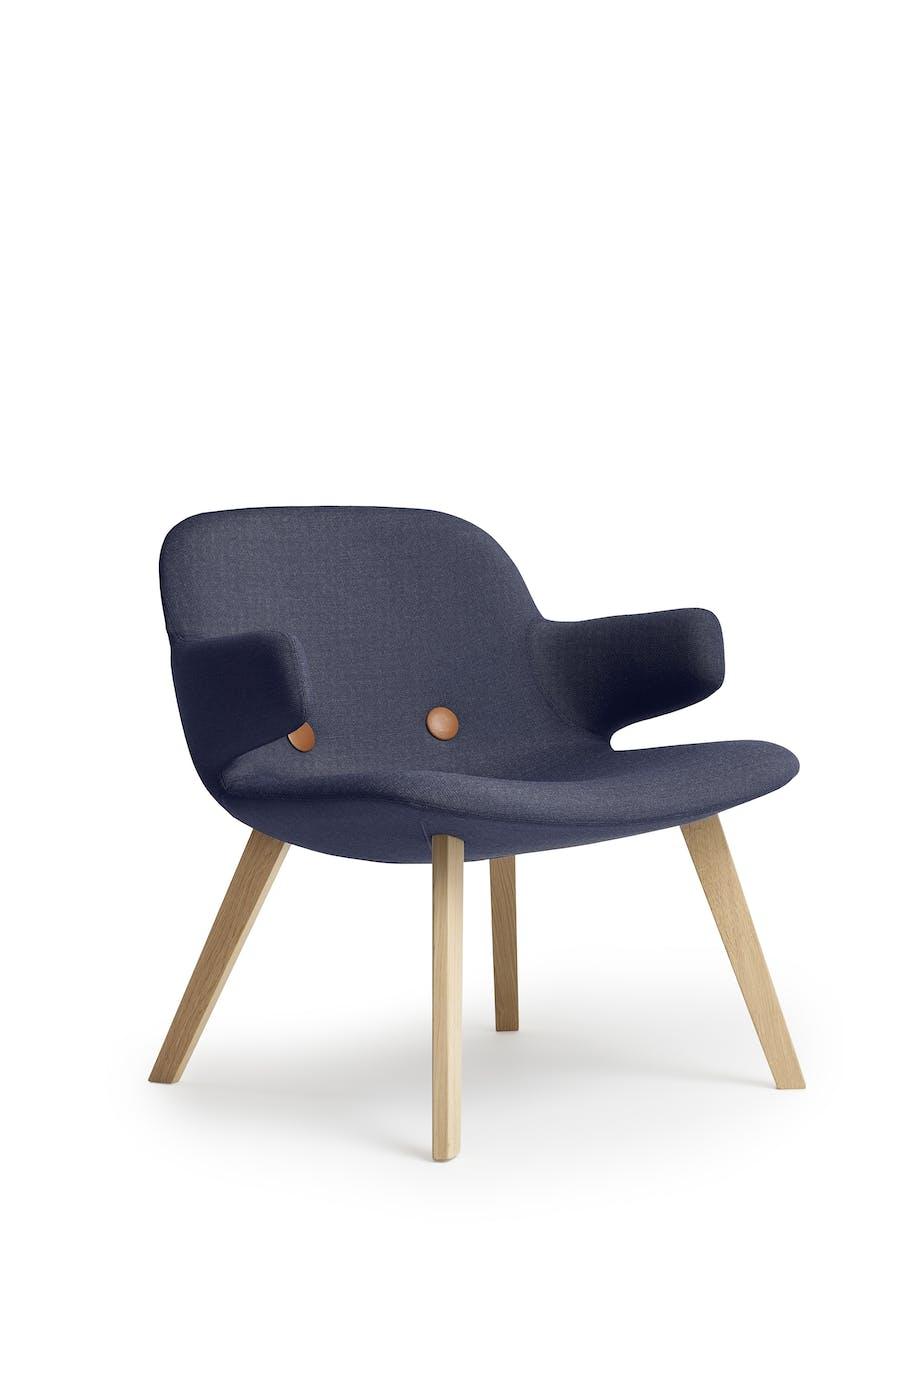 Erik Jørgensen Eyes Lounge Arm chair